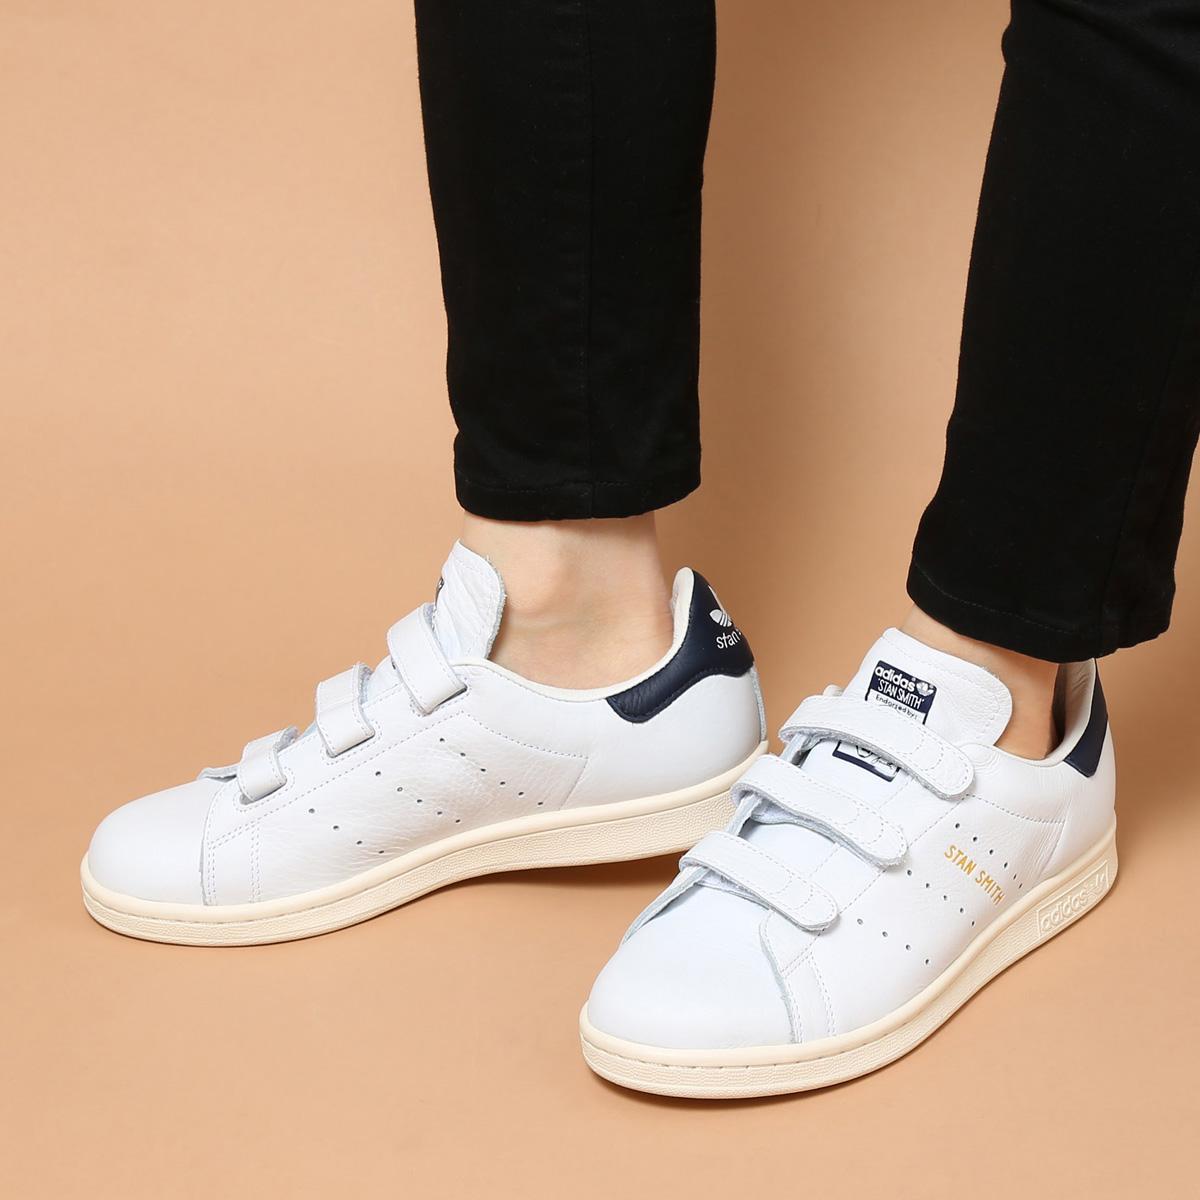 adidas Originals STAN SMITH CF (アディダス スタン スミス CF) RUNNING WHITE/COLLEGIATE NAVY/CHALK WHITE【メンズ レディース スニーカー】【ベルクロ】17SS-I